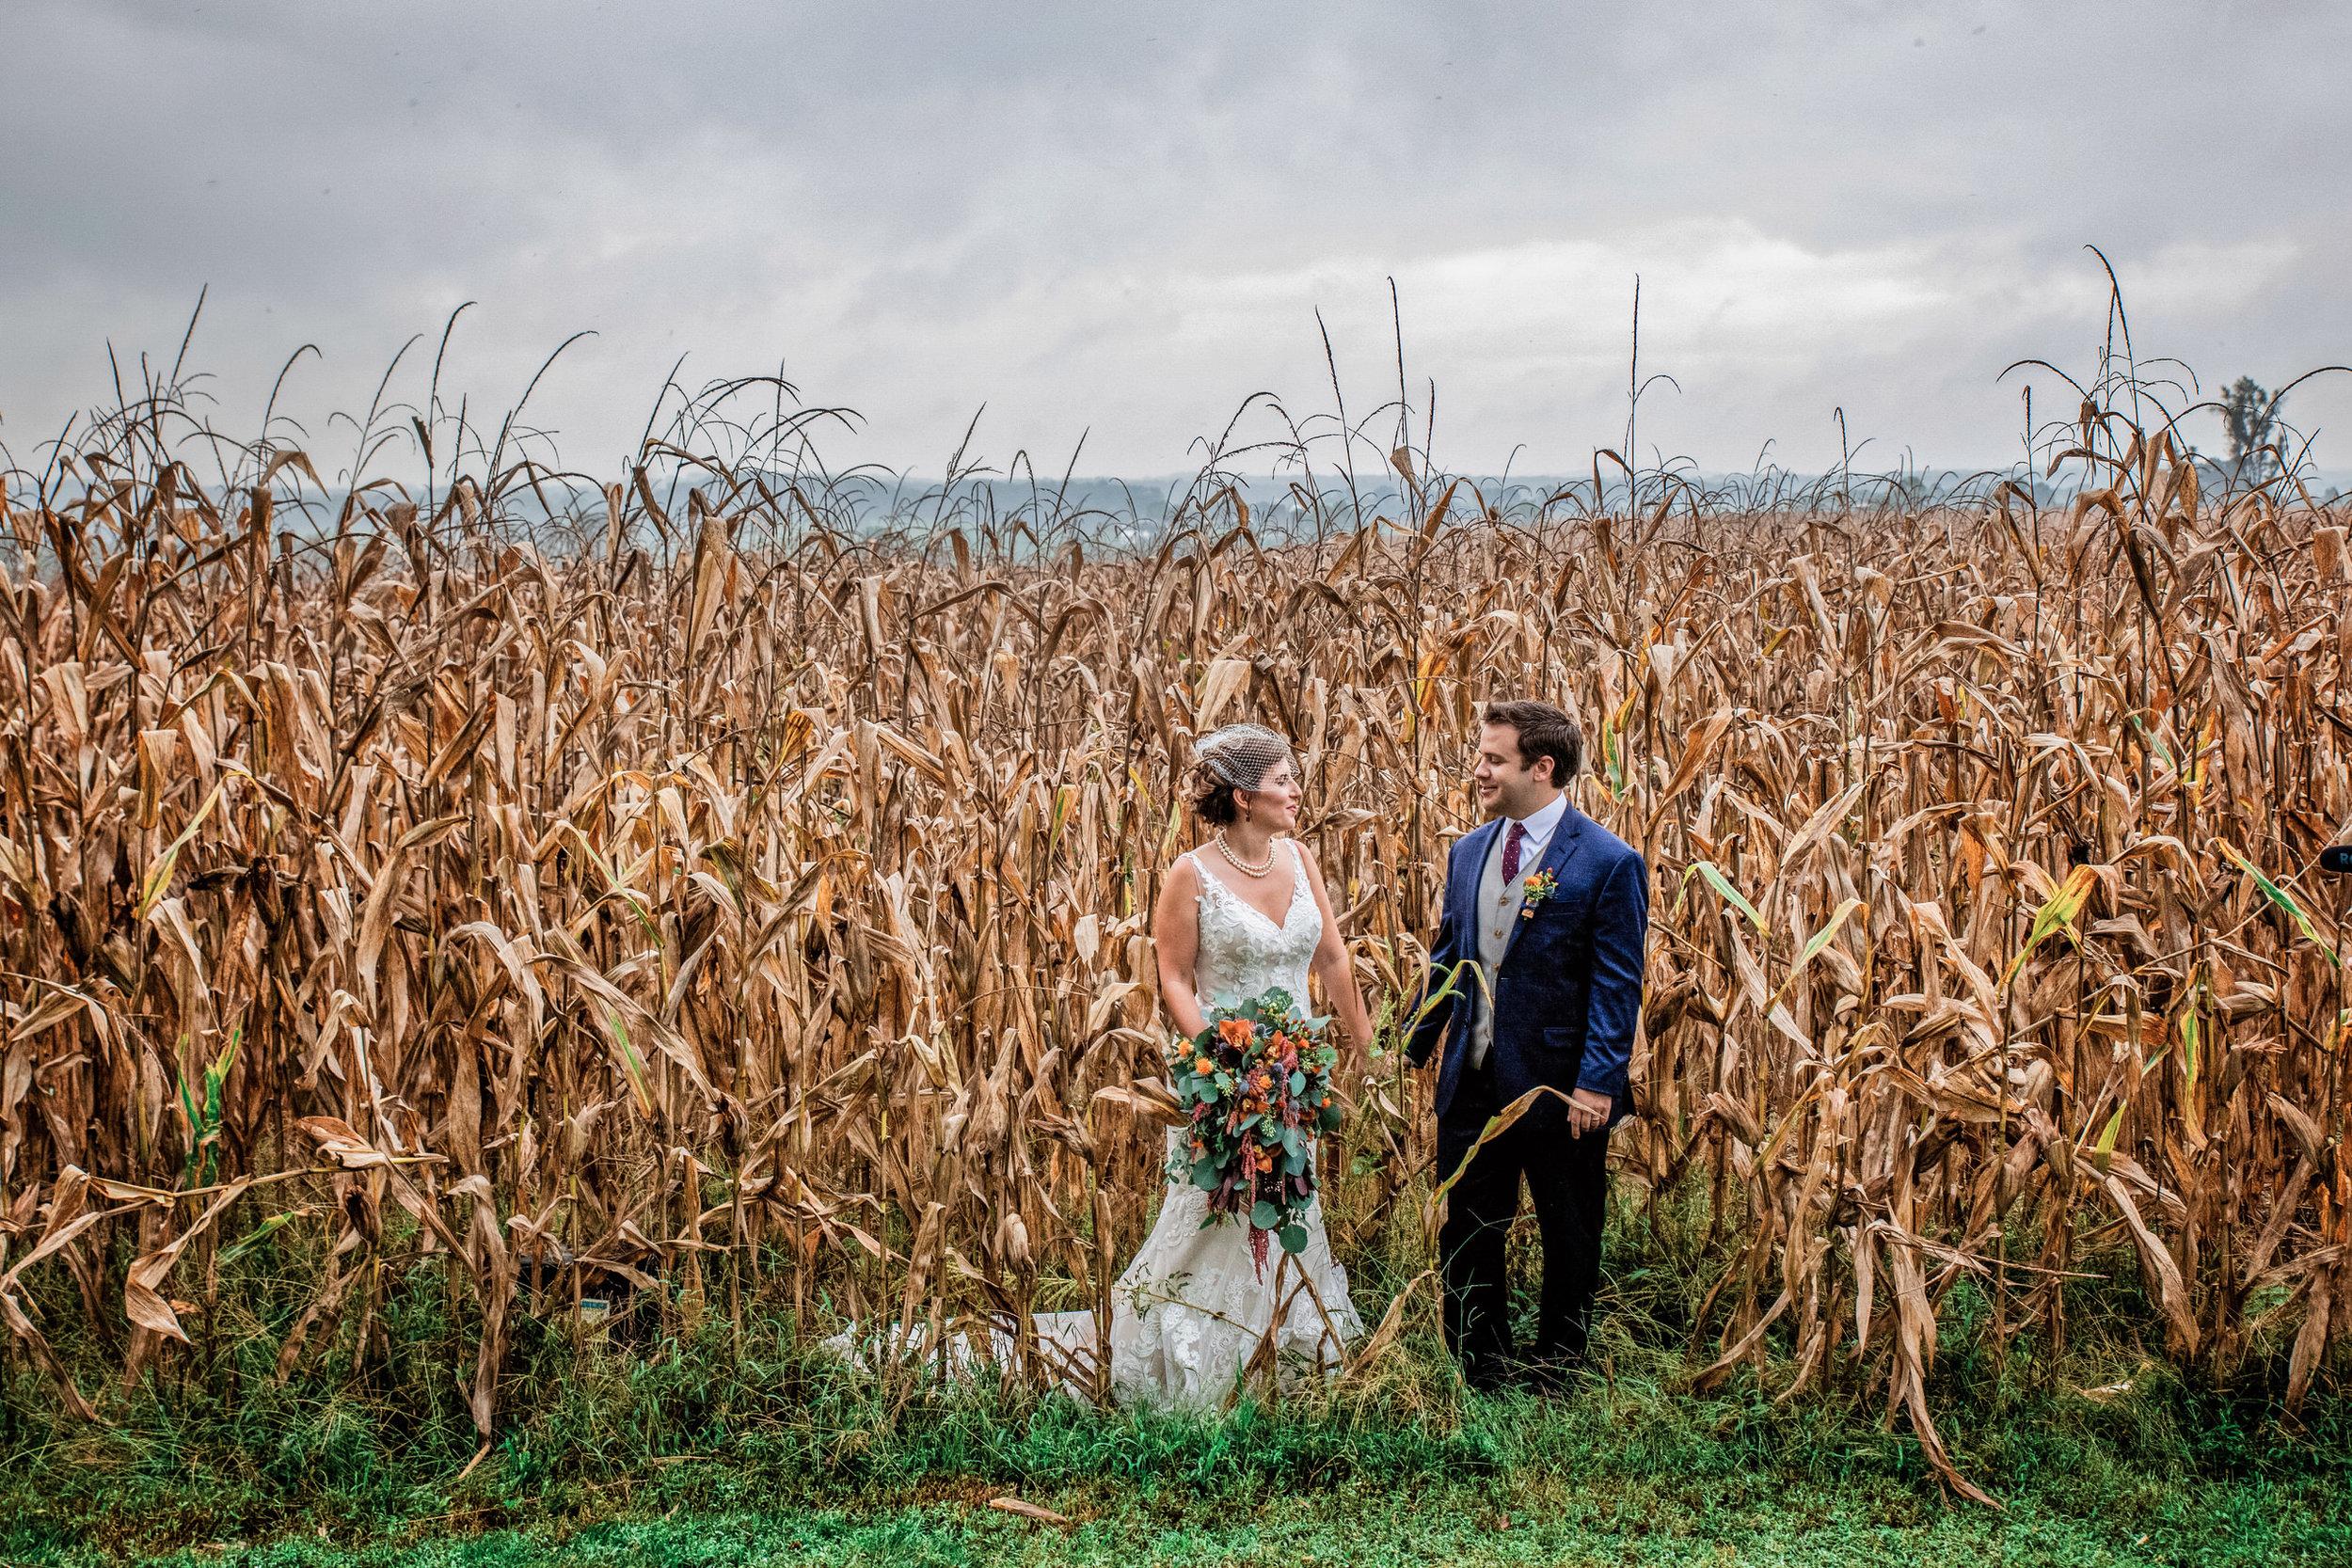 WalkersOverlookWedding-Angela&Ben-WeddingParty-26.jpg